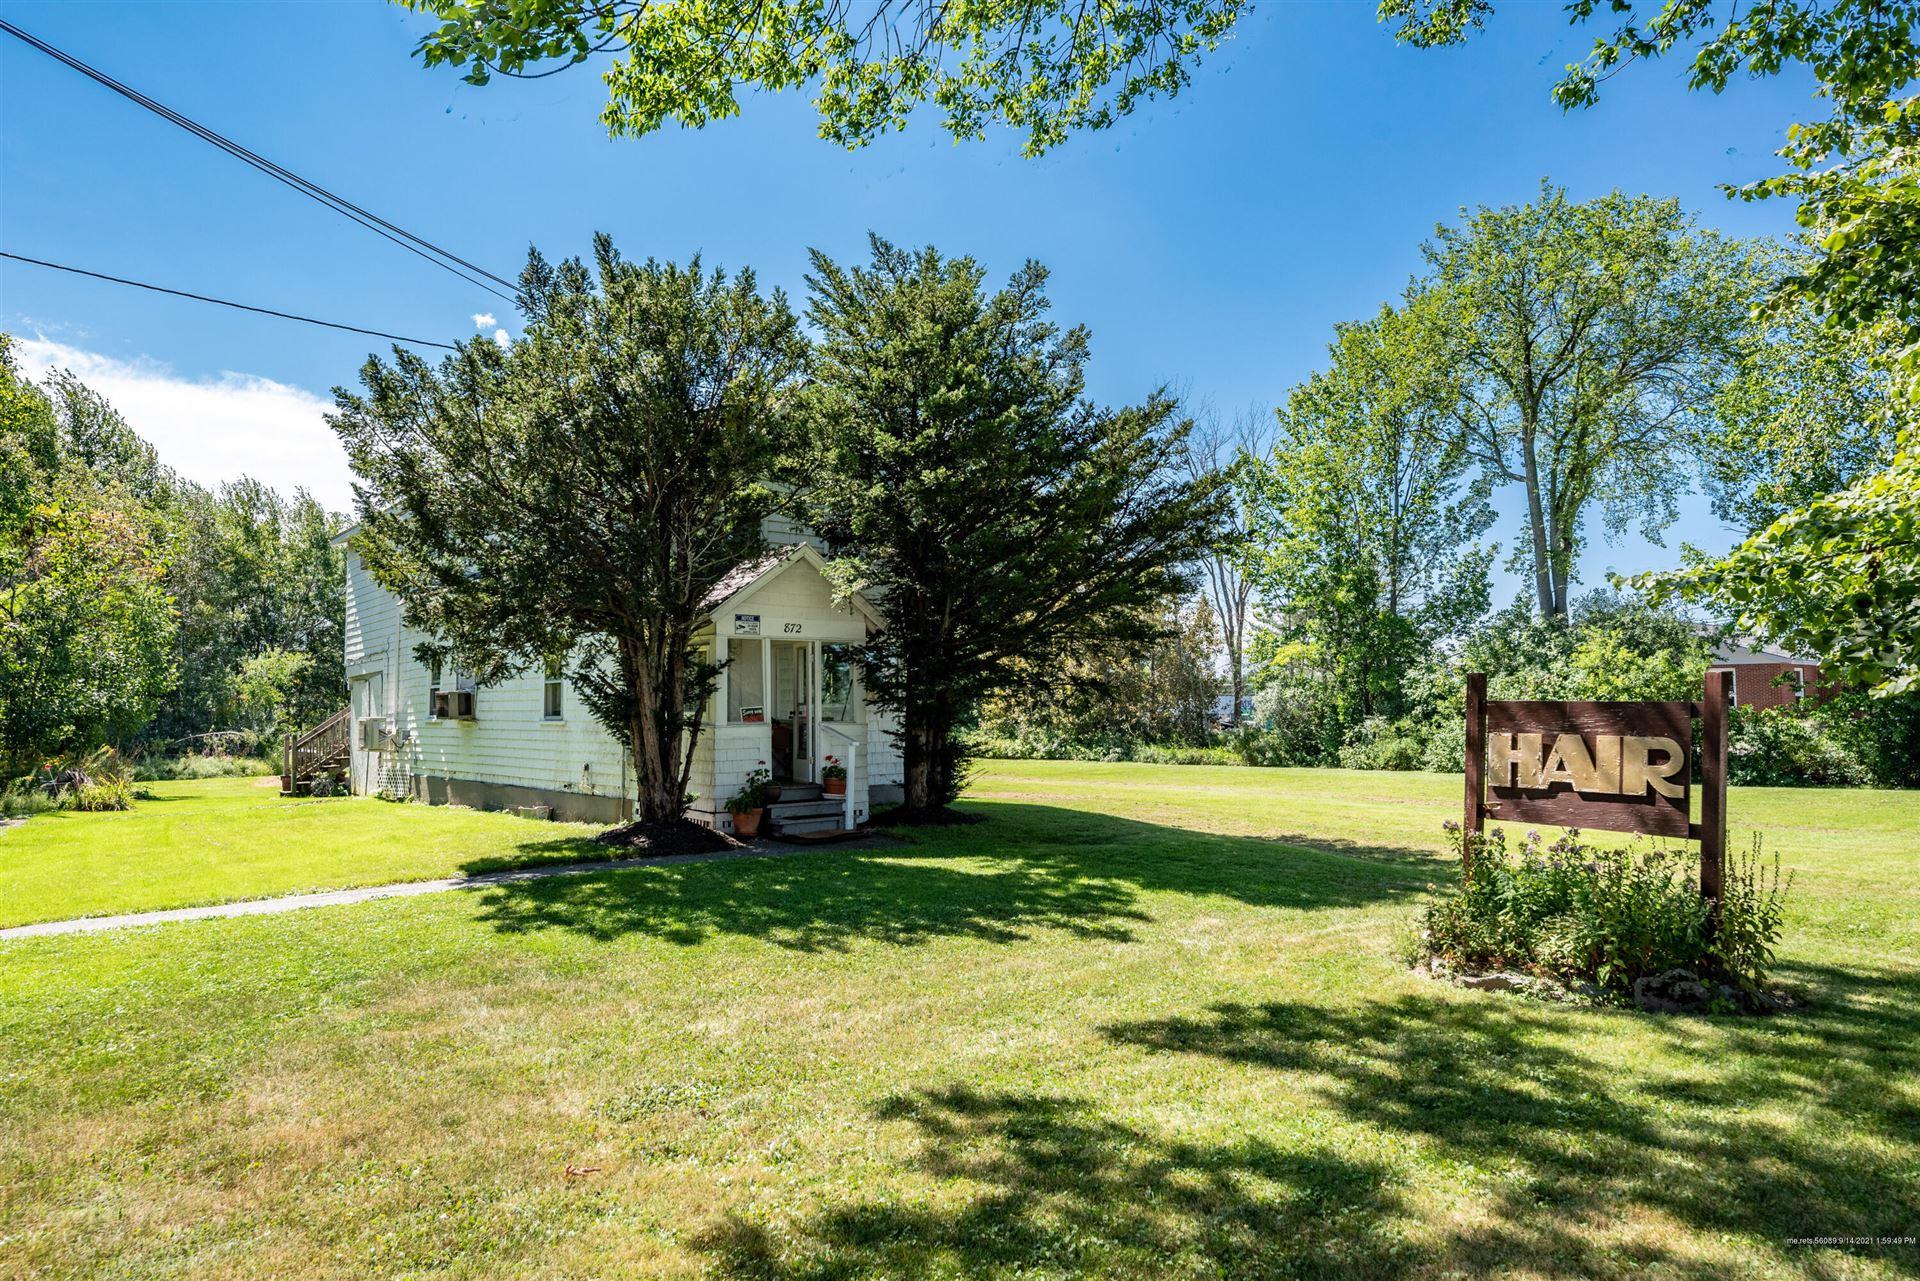 Photo of 872 Hammond Street, Bangor, ME 04401 (MLS # 1508790)